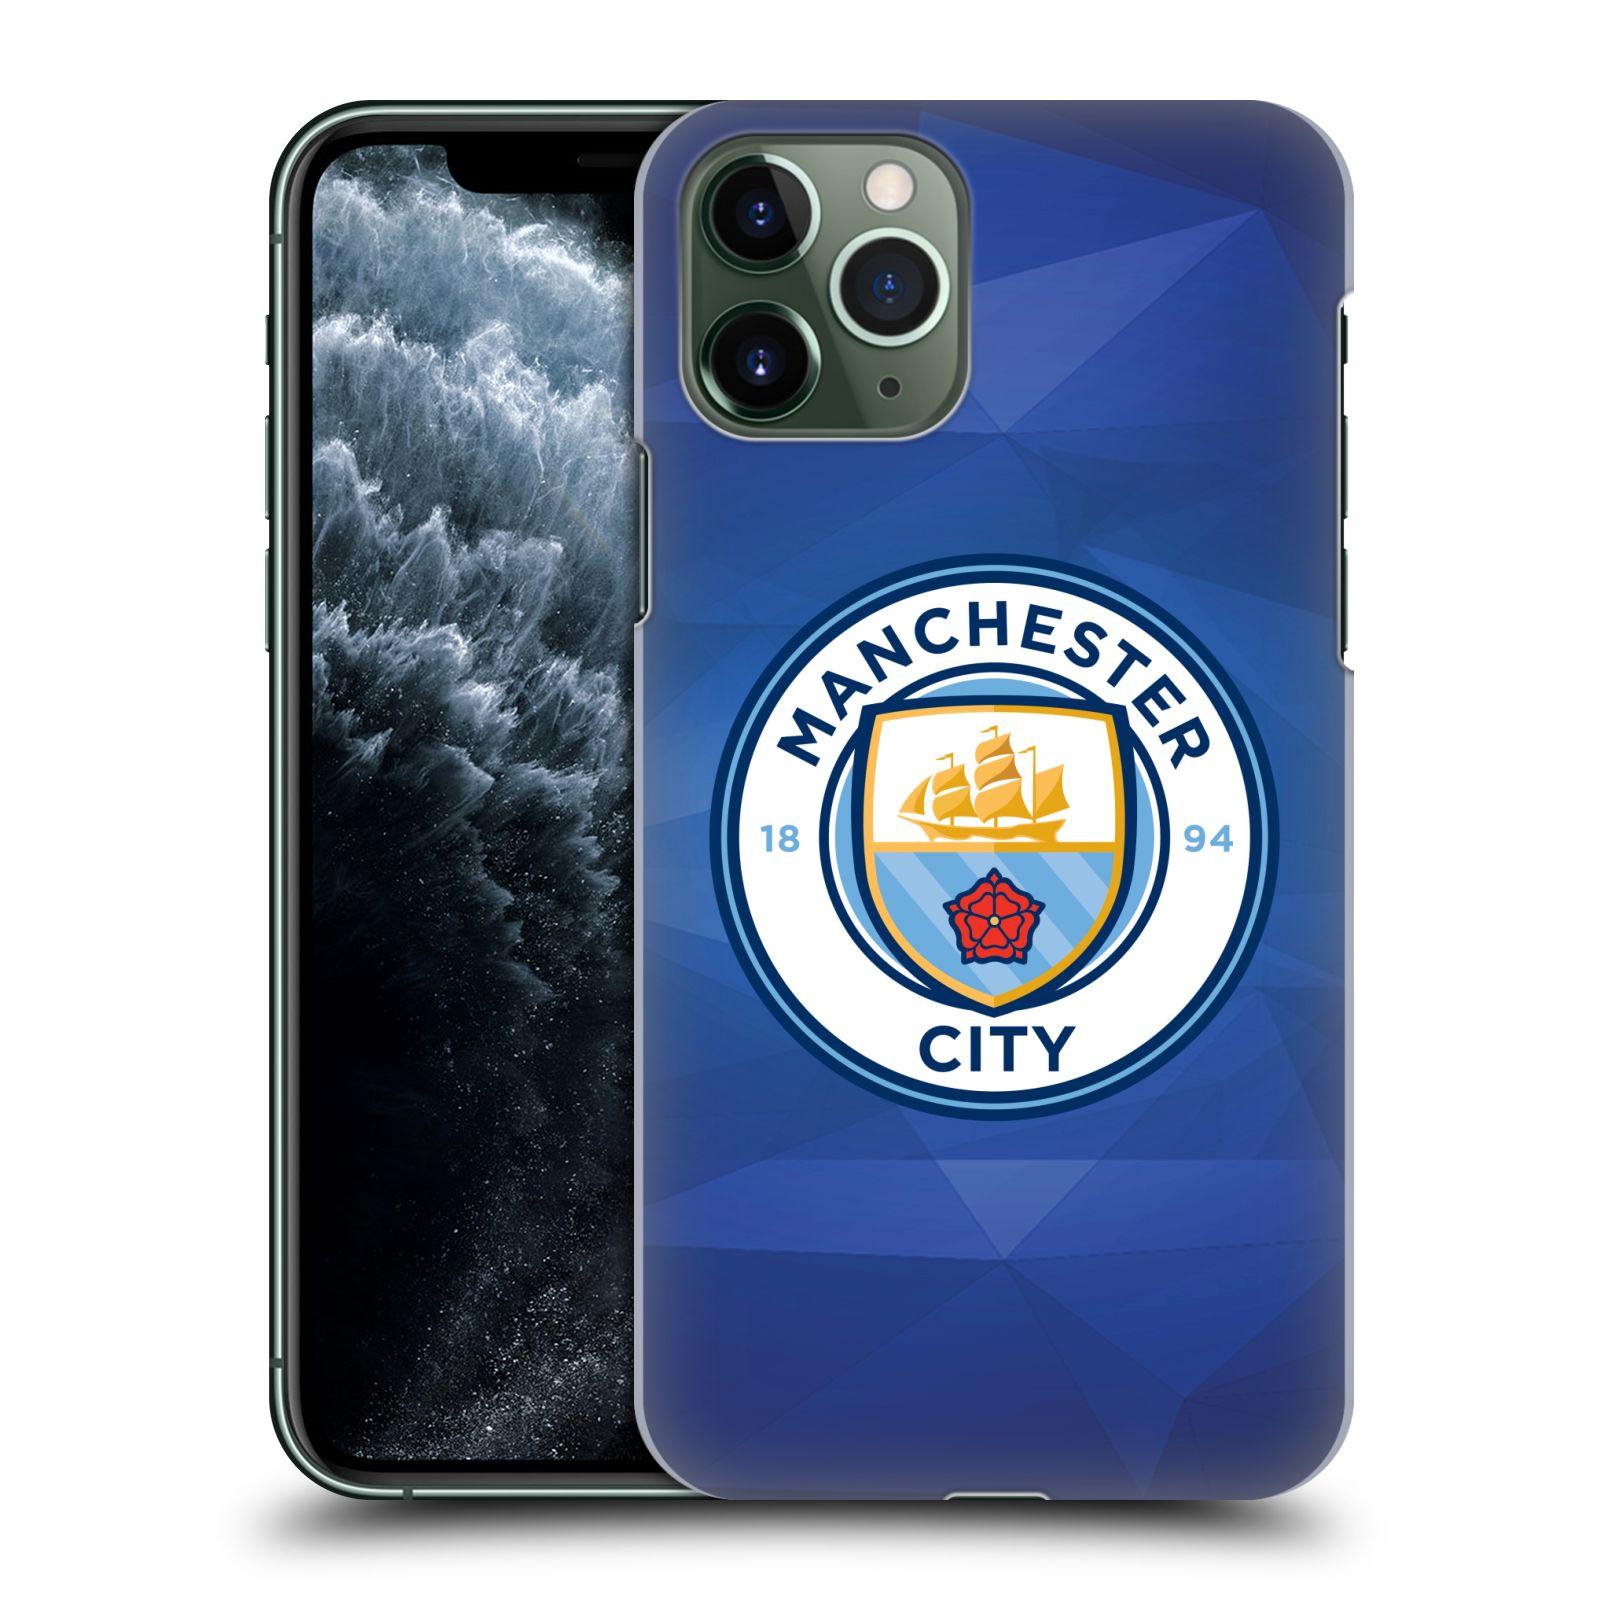 Plastové pouzdro na mobil Apple iPhone 11 Pro - Head Case - Manchester City FC - Modré nové logo